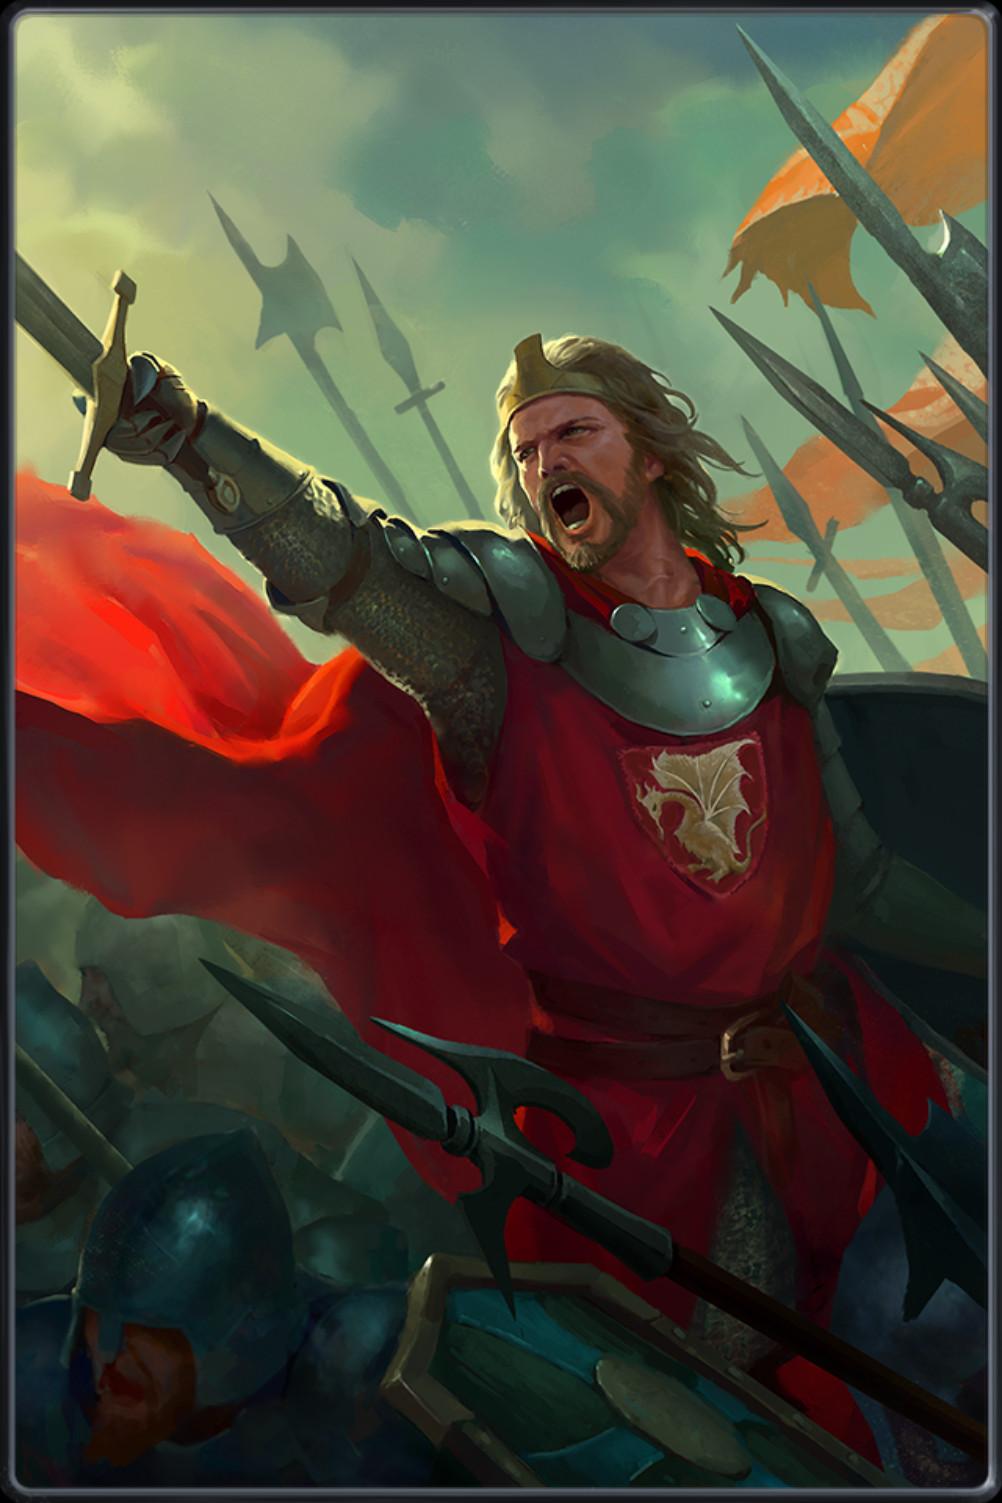 KING ARTHUR GETS A FRANCHISE - WHO SHOULD STAR? - Comic ...  |Camelot King Arthur Movie